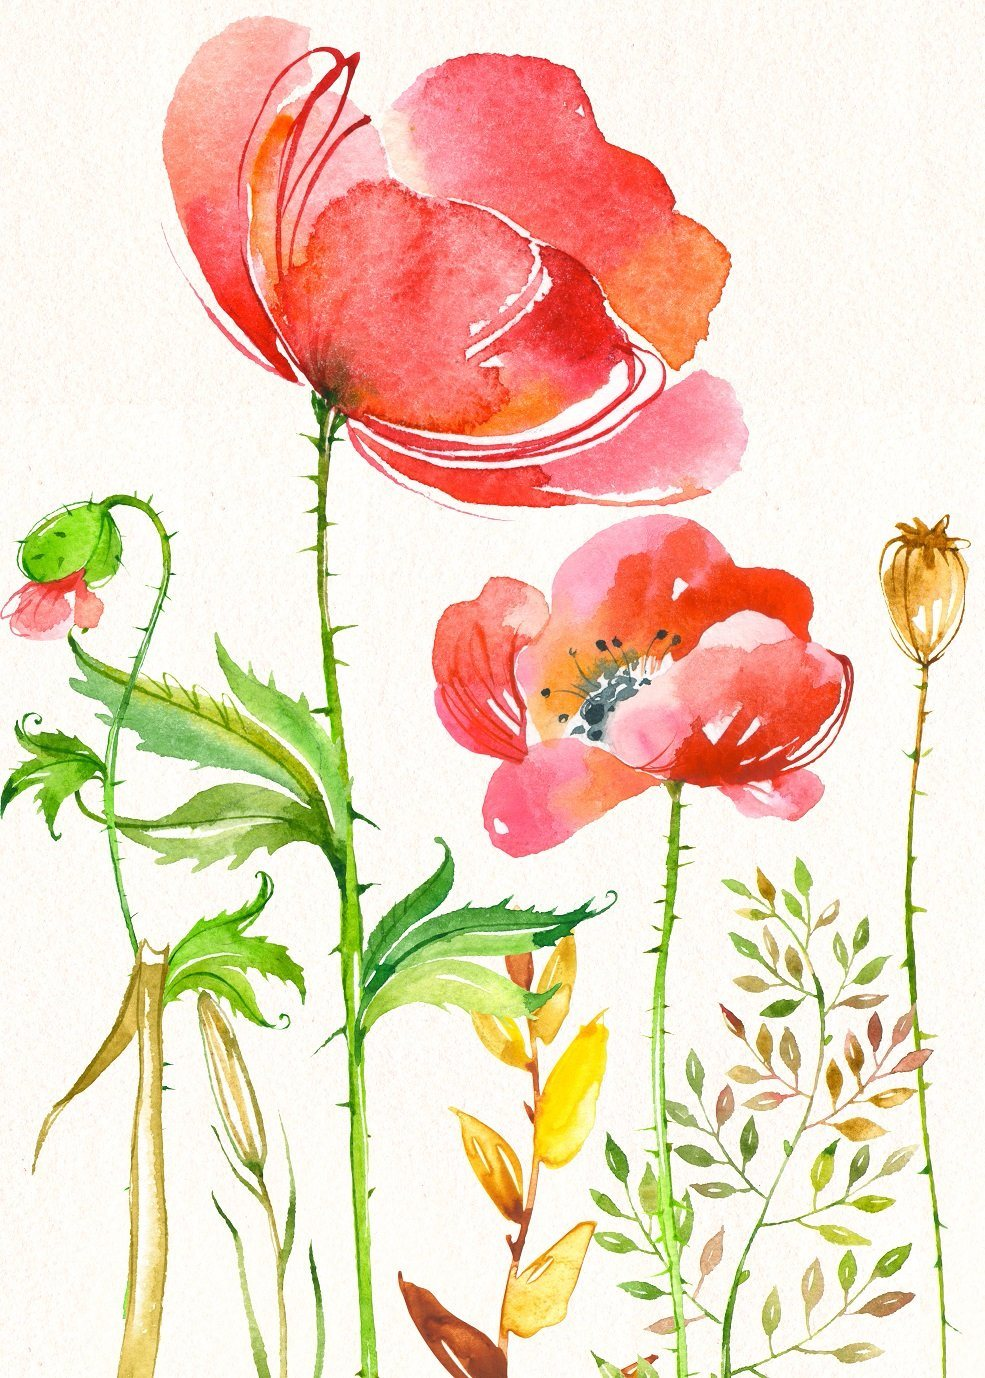 China Modern Pretty Flower Handmade Oil Painting For Wall Art